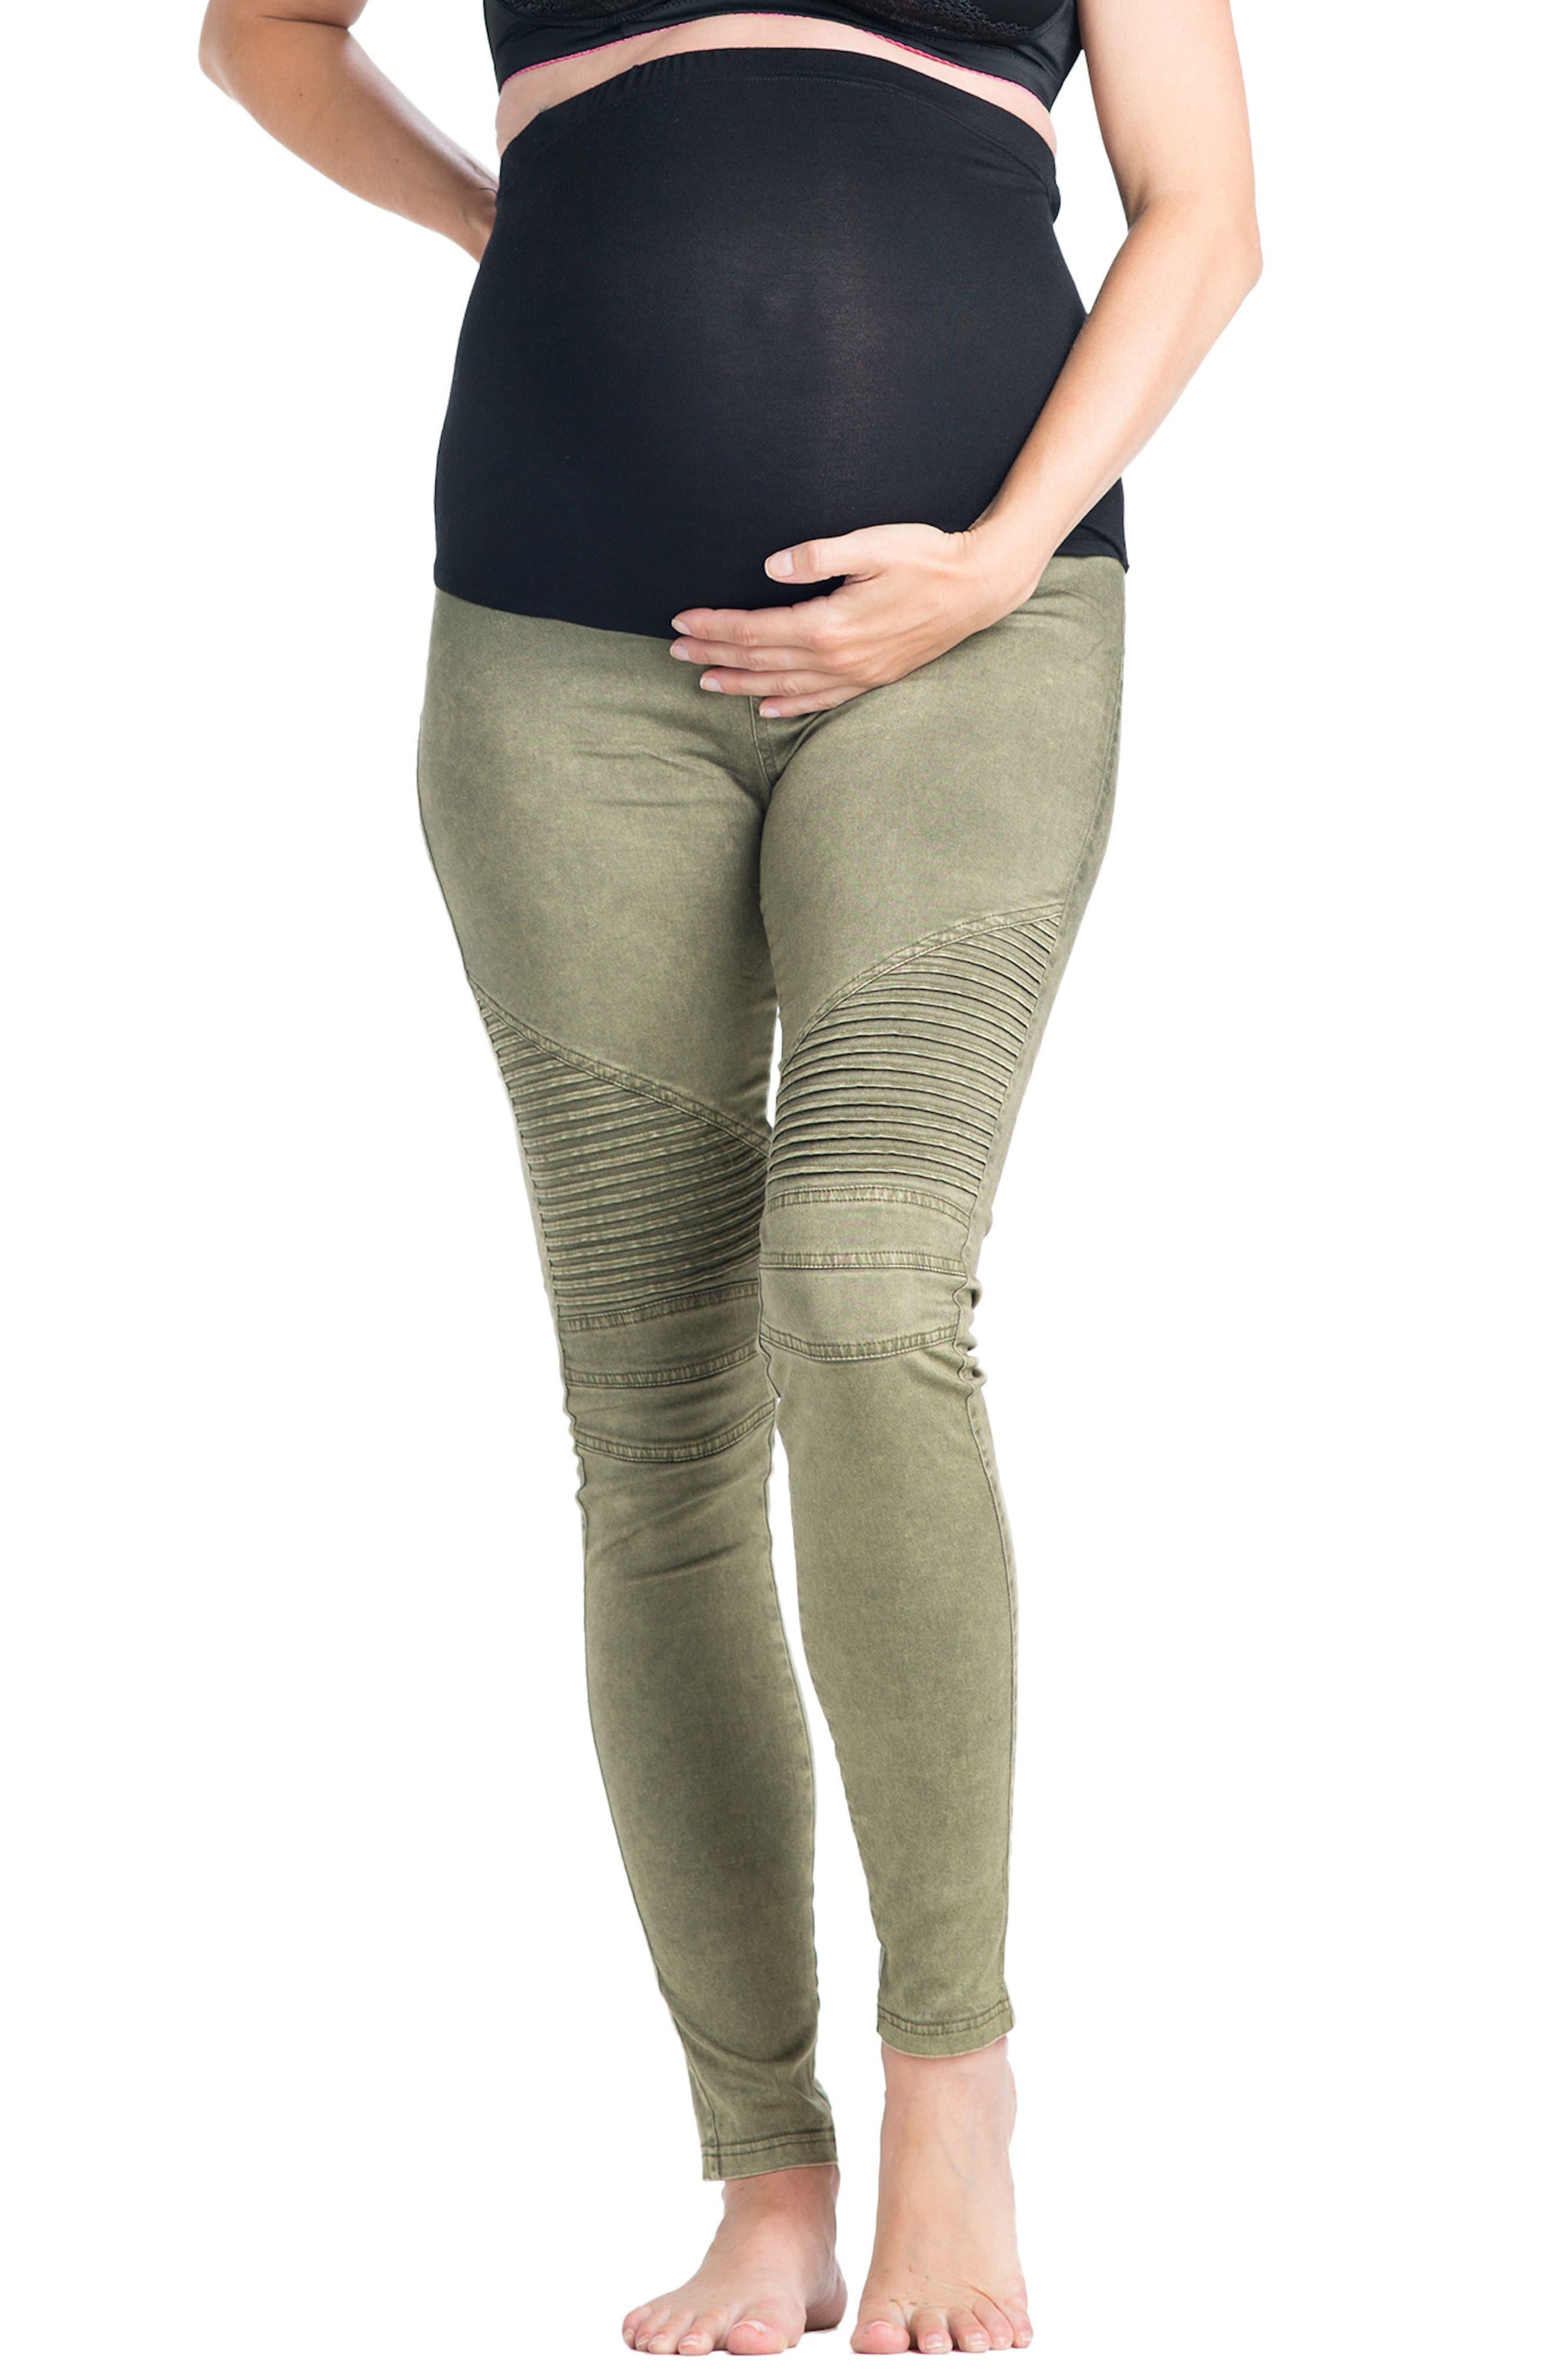 Alternate Image 1 Selected - Preggo Leggings Moto Maternity Leggings